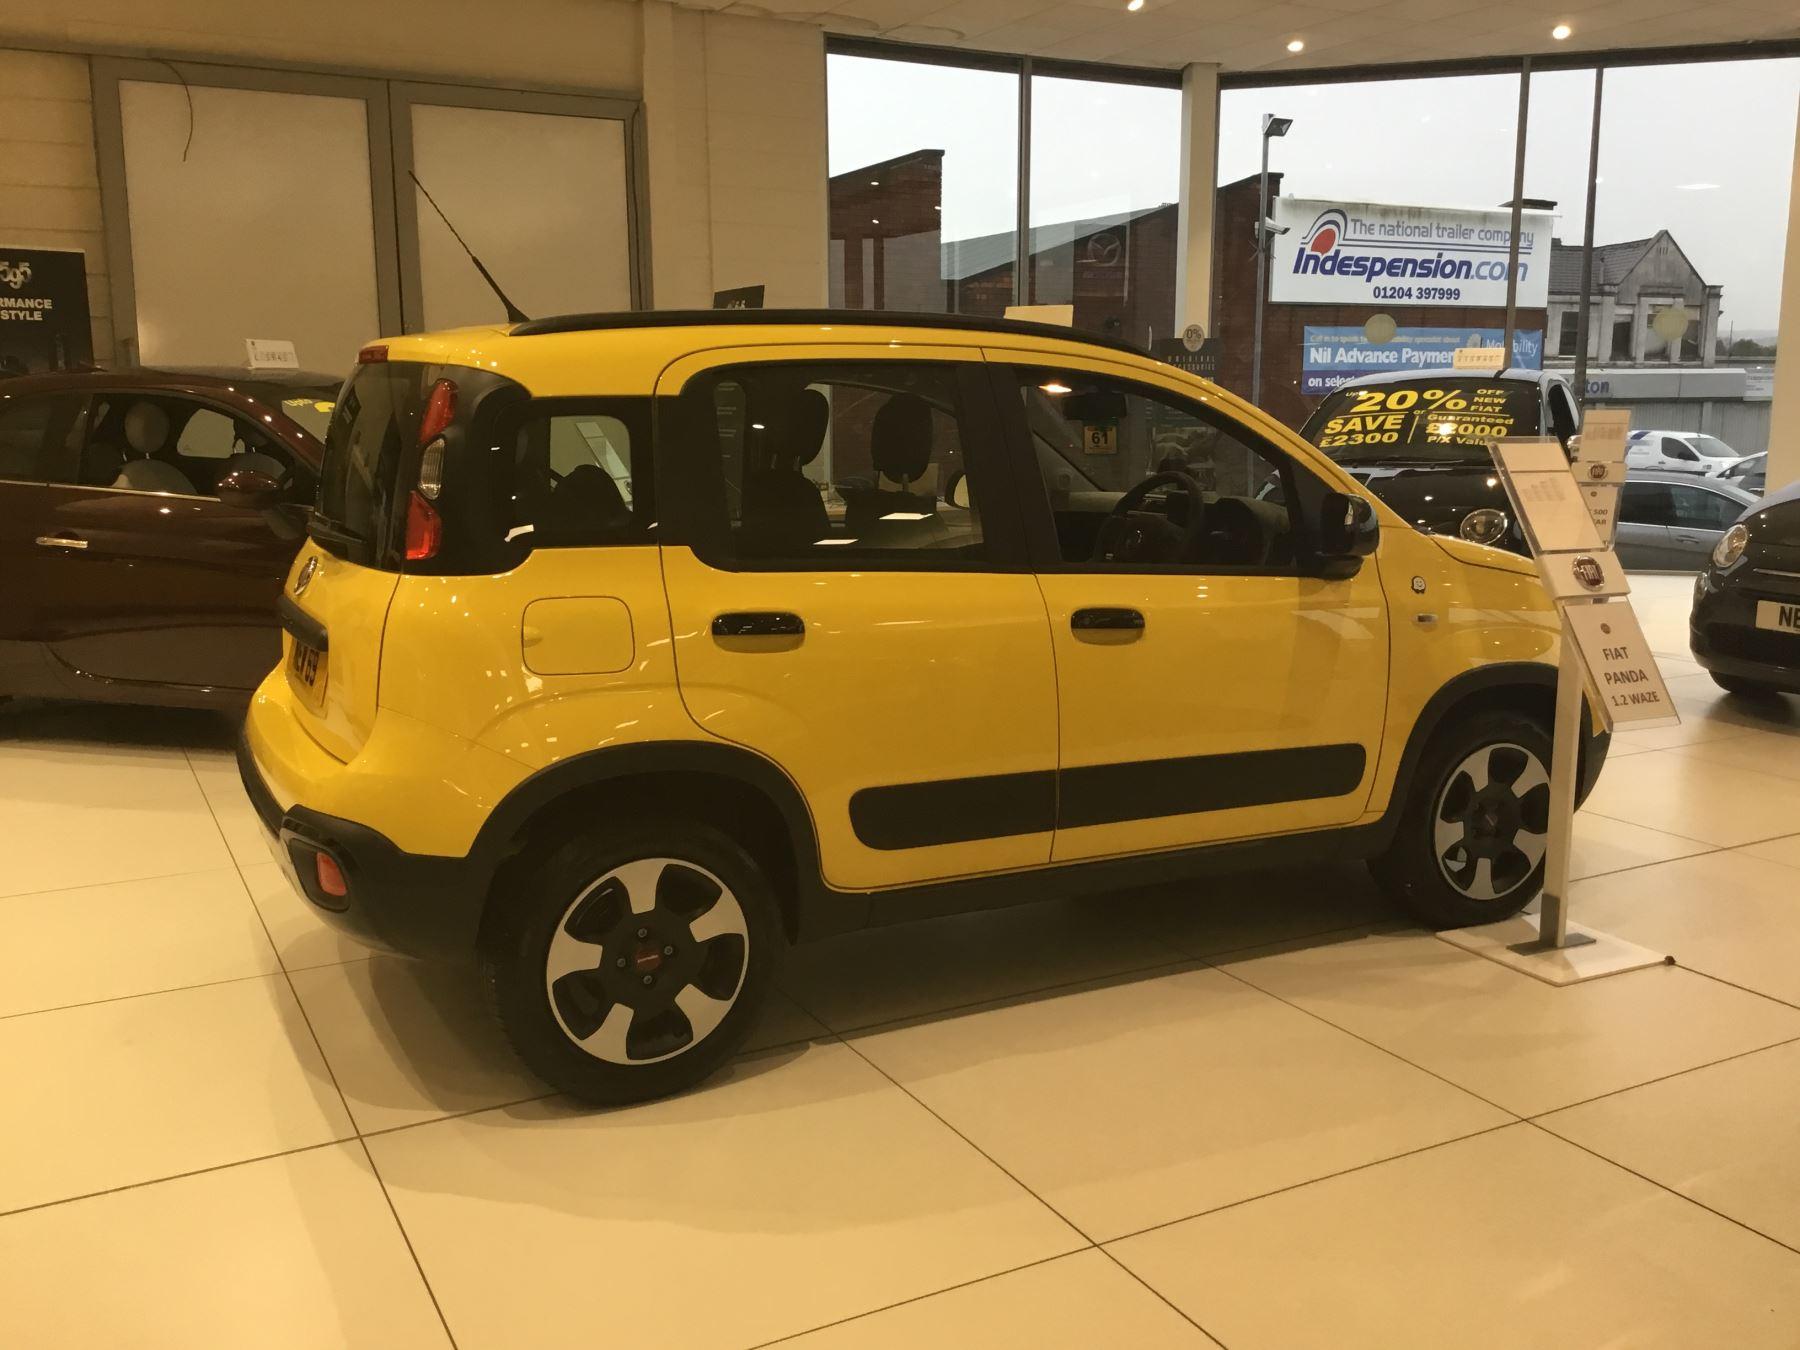 Fiat Panda 1.2 Waze SPECIAL EDITIONS image 9